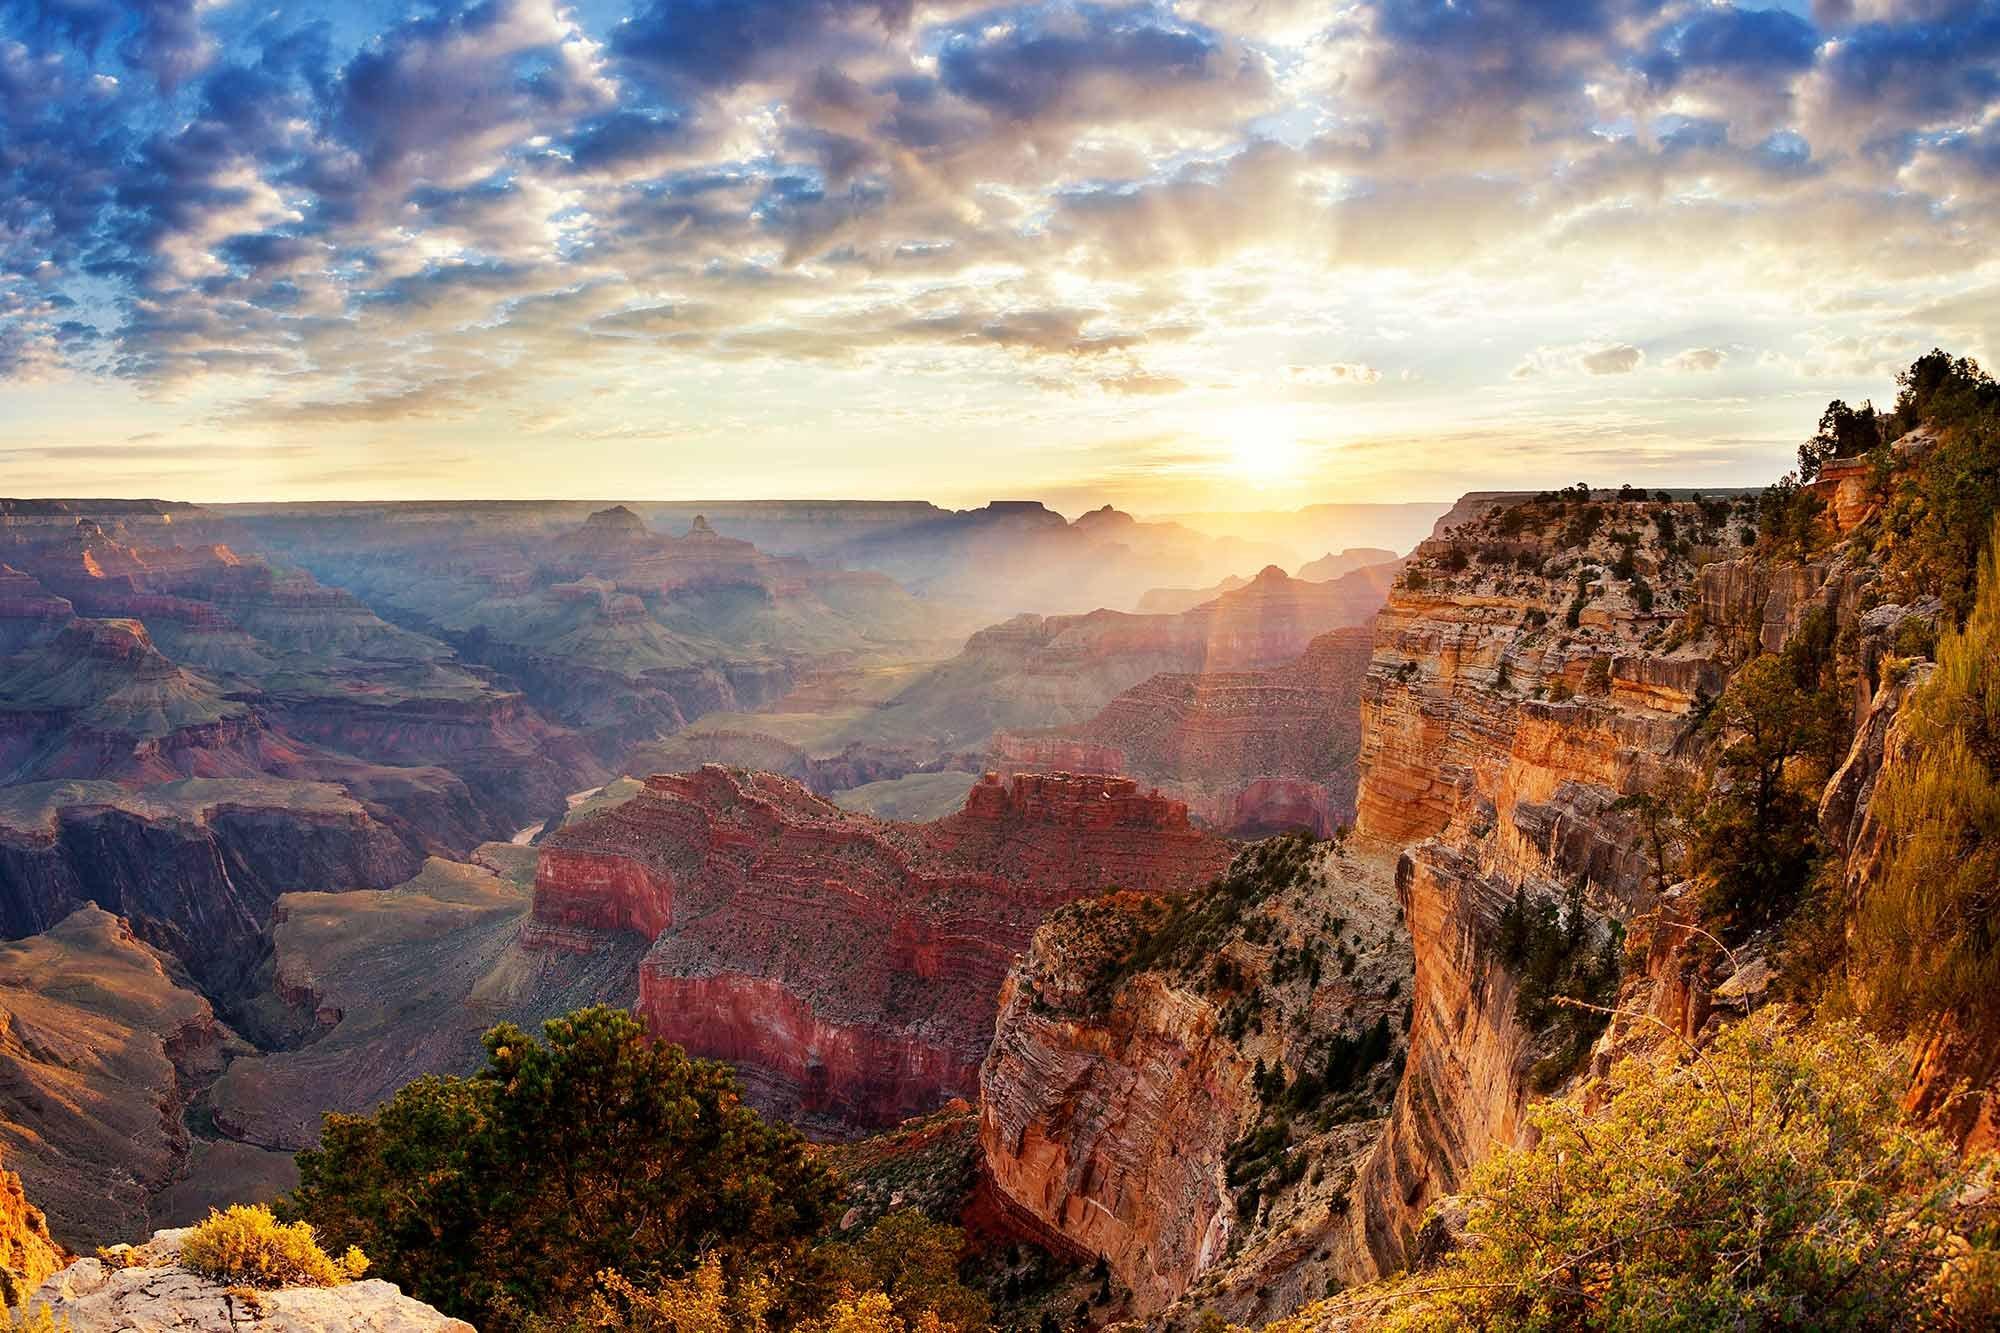 Sunrise peeking over the ridge of the Grand Canyon